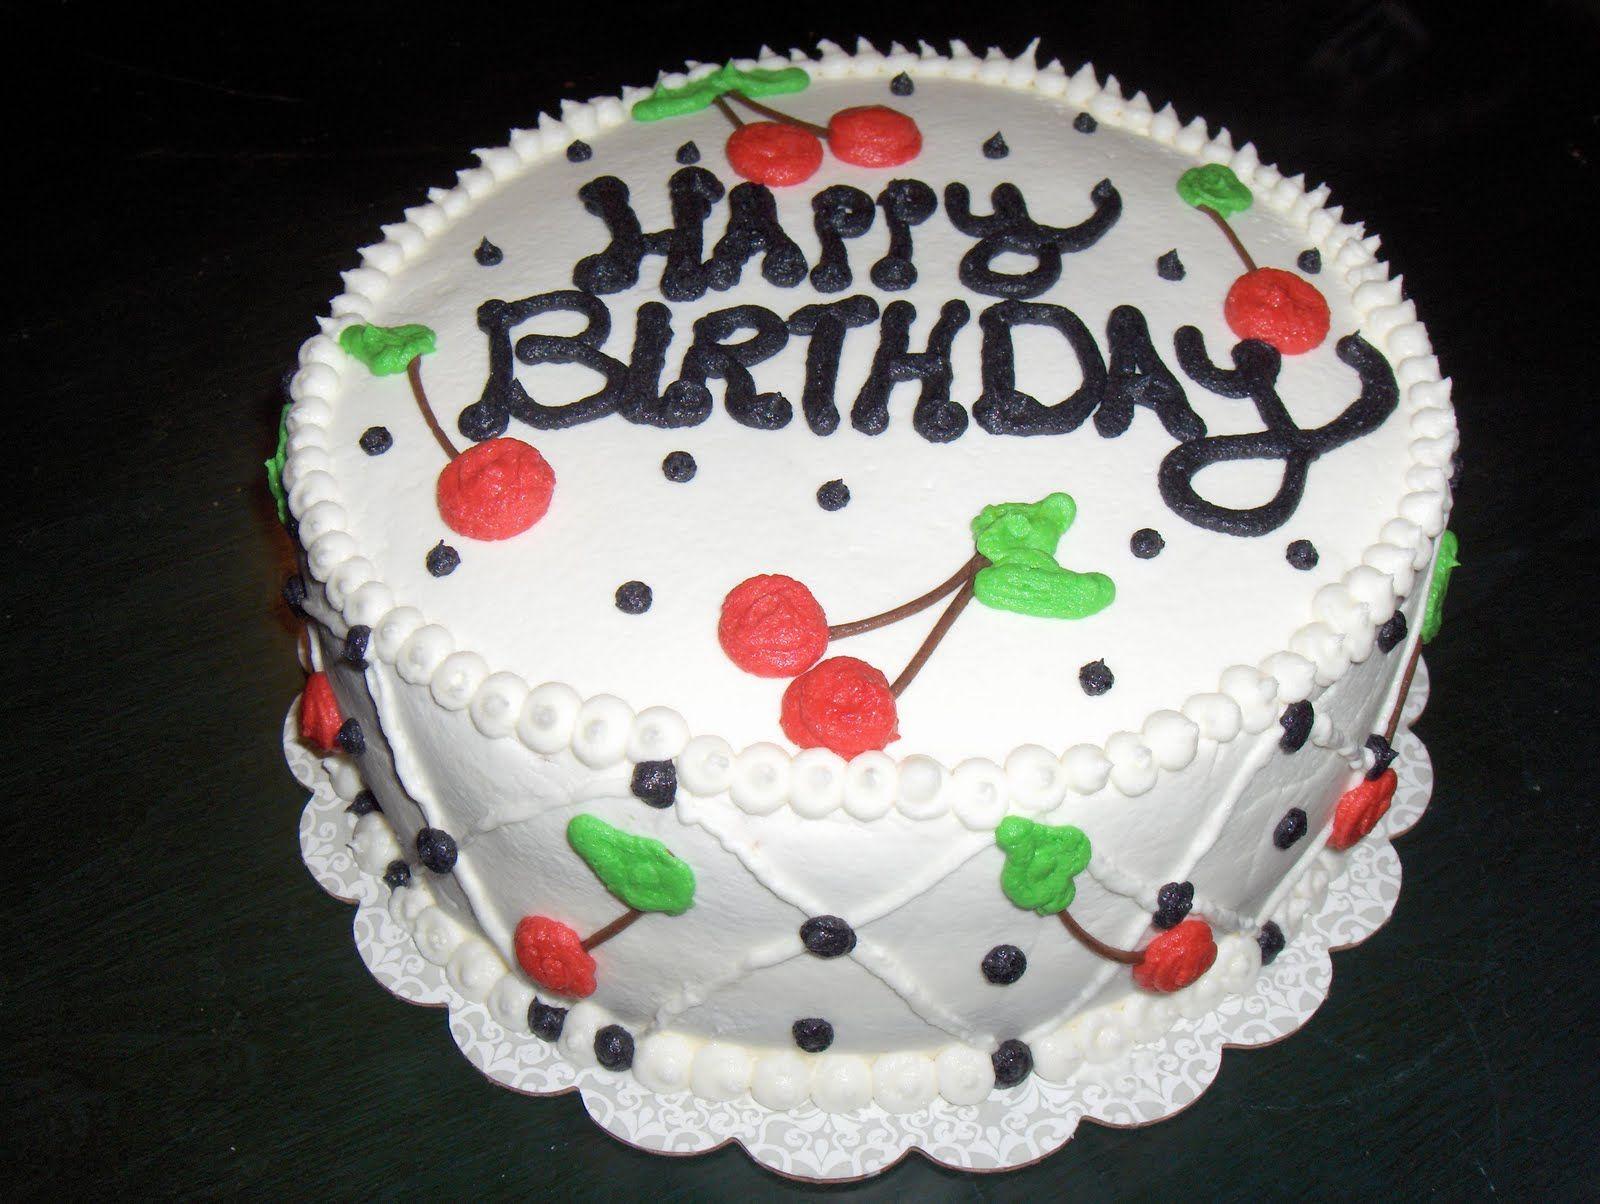 Cats Cake Creations Cherries Birthday Cake Let Them Eat cake